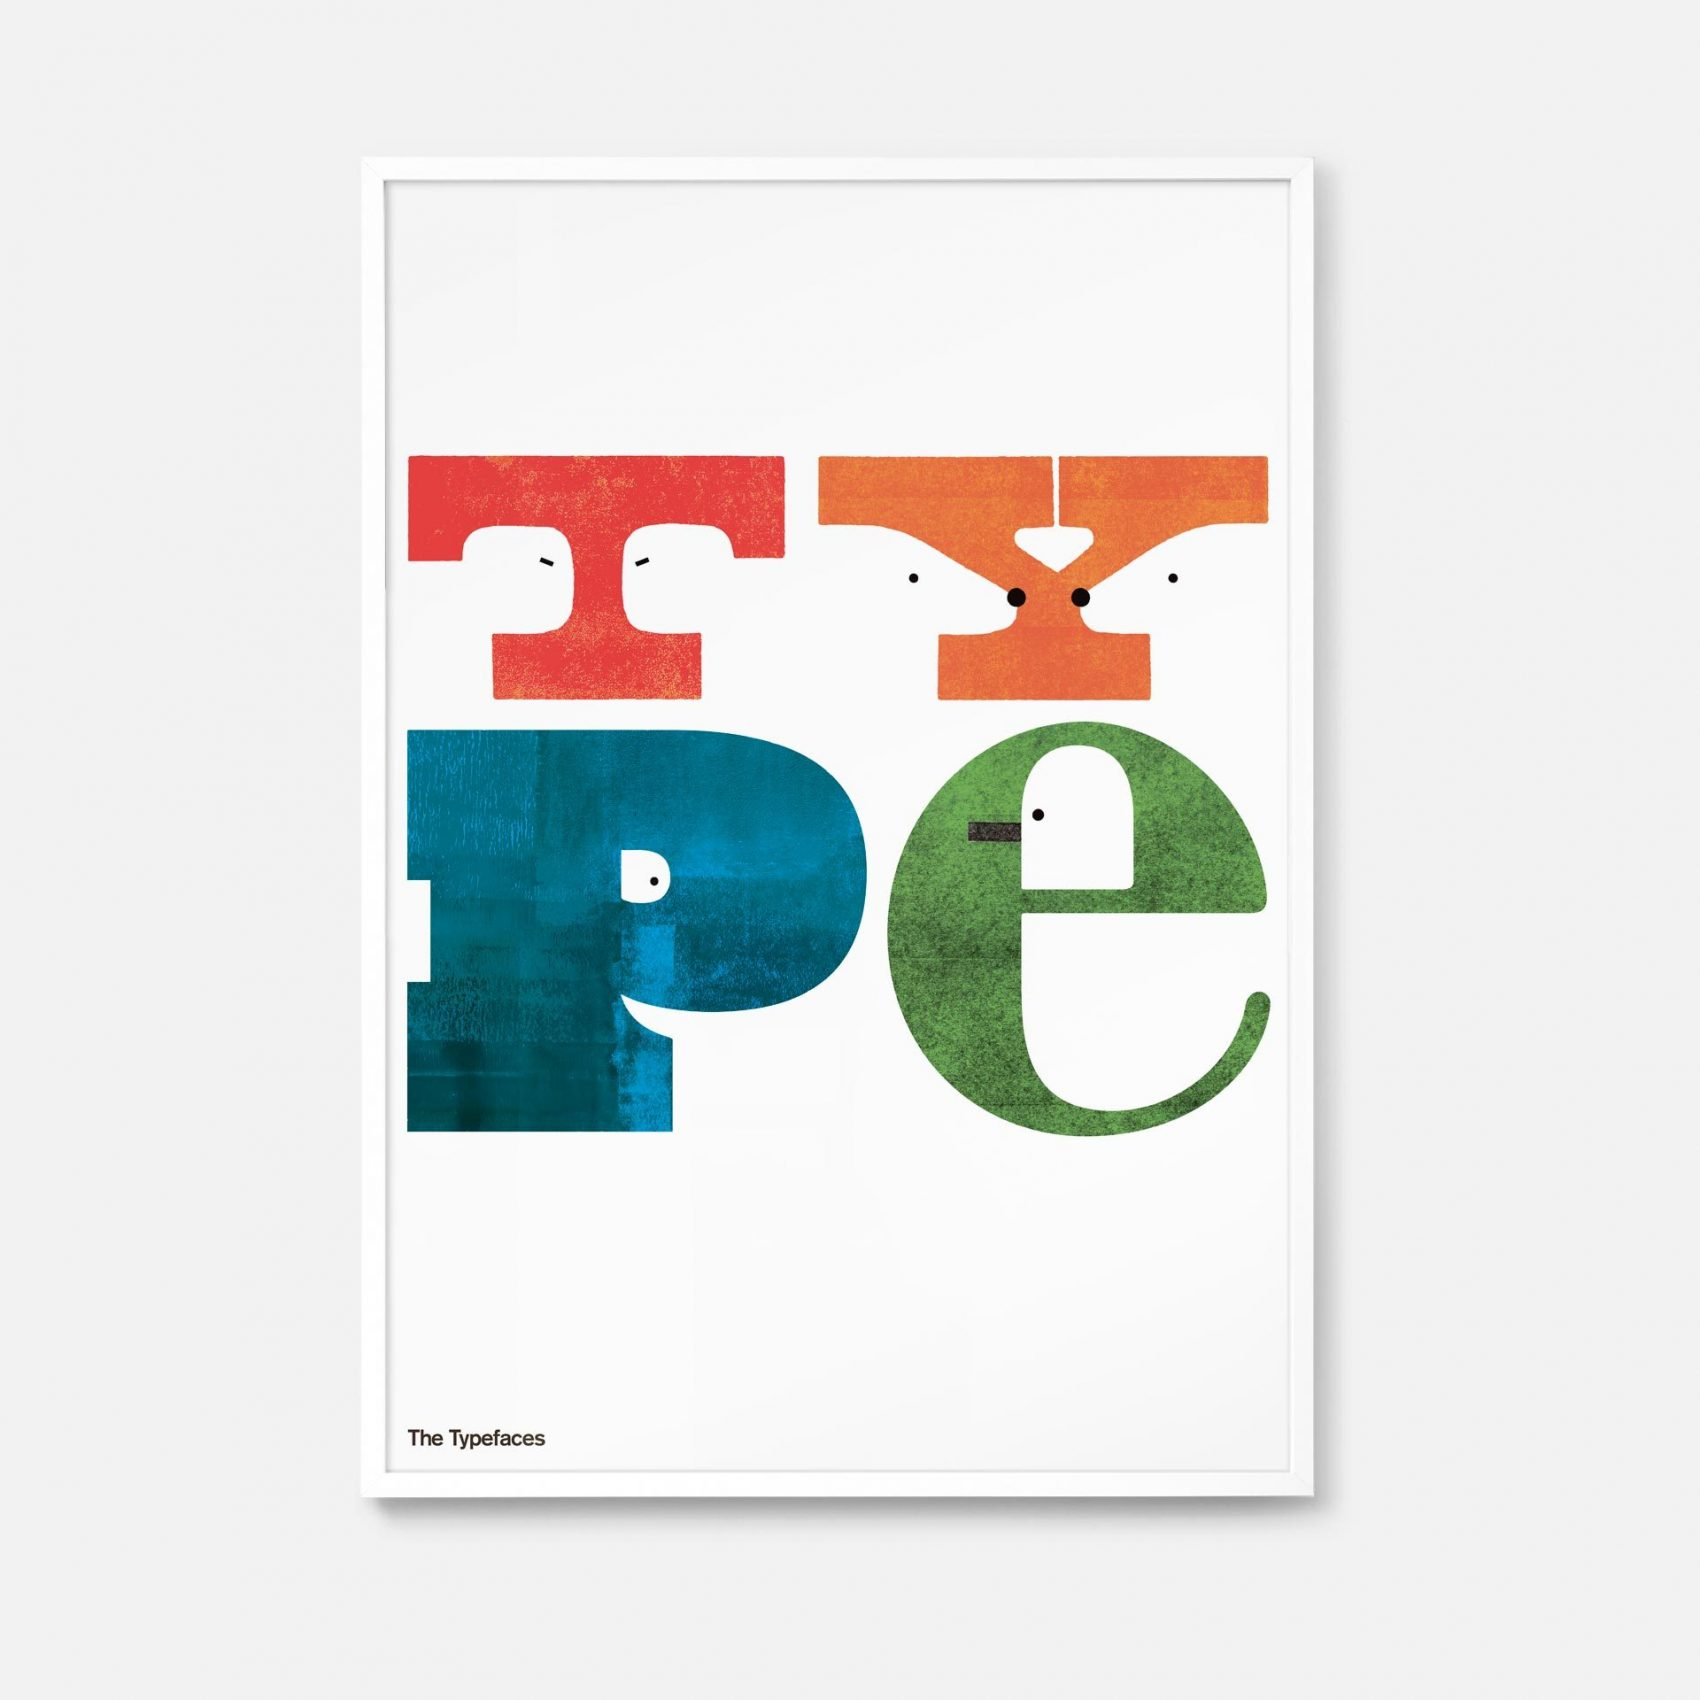 MadeByFolk-typefaces.jpg